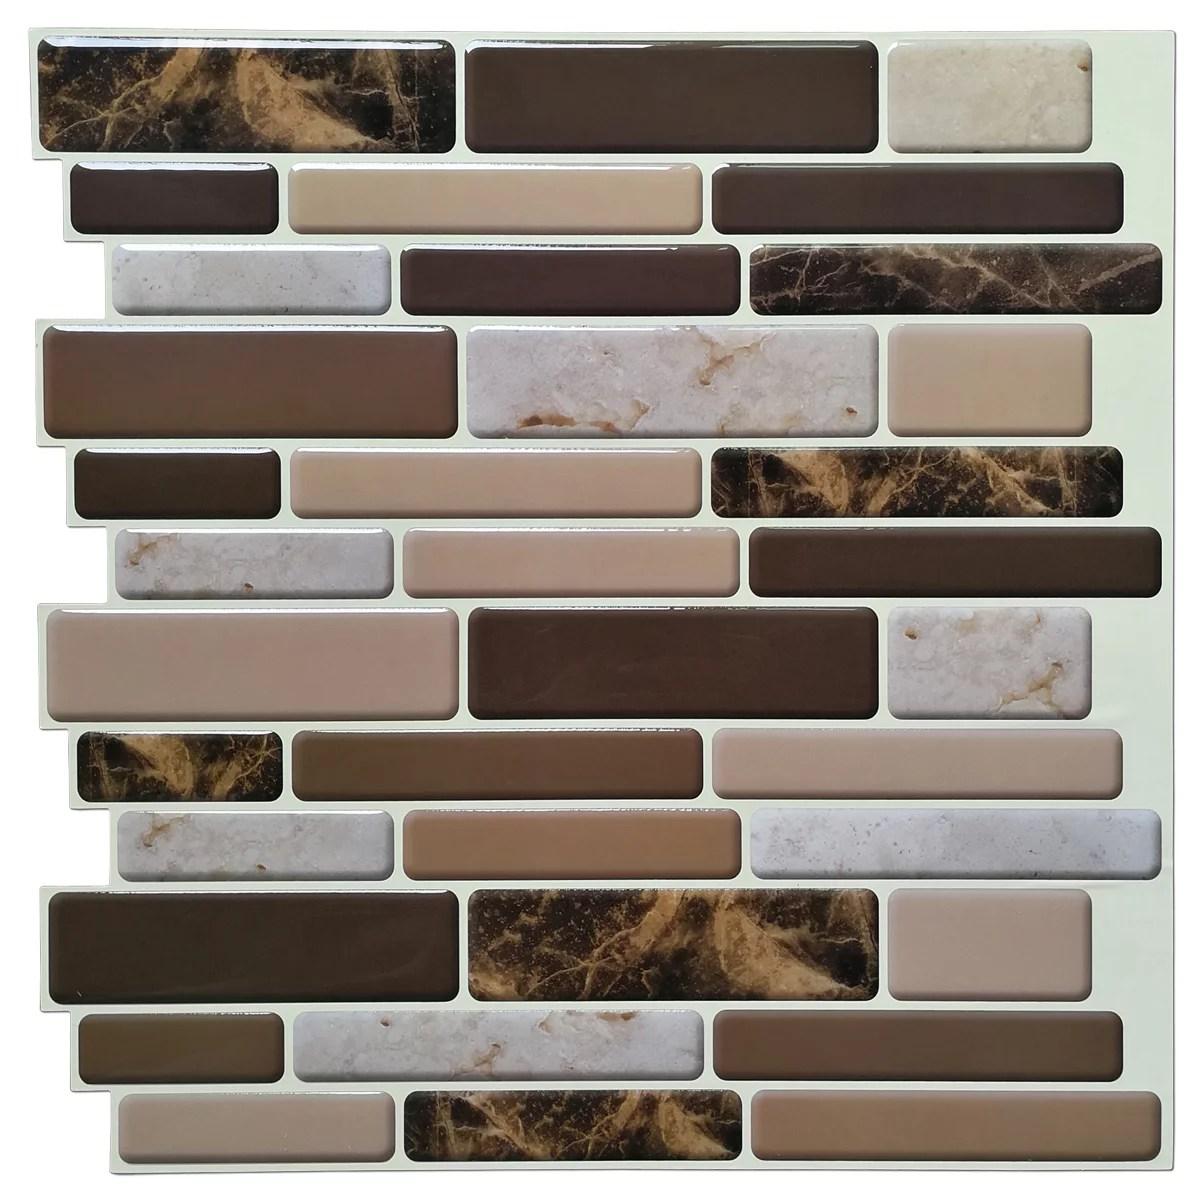 10 tiles self adhesive wall tile peel and stick backsplash tile for kitchen 12 x12